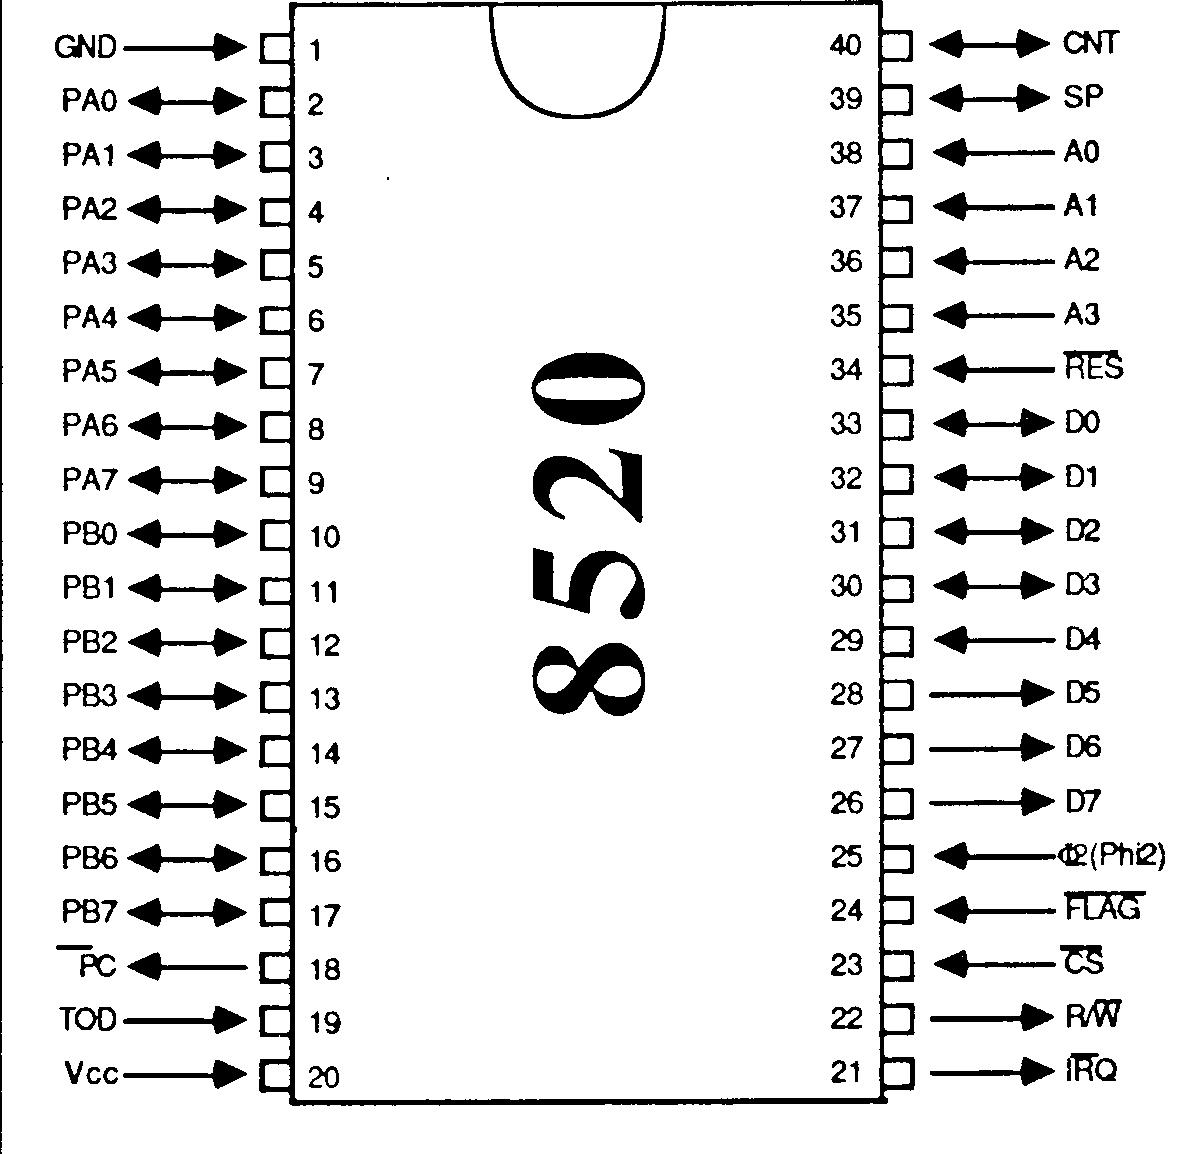 Boot Selector A500